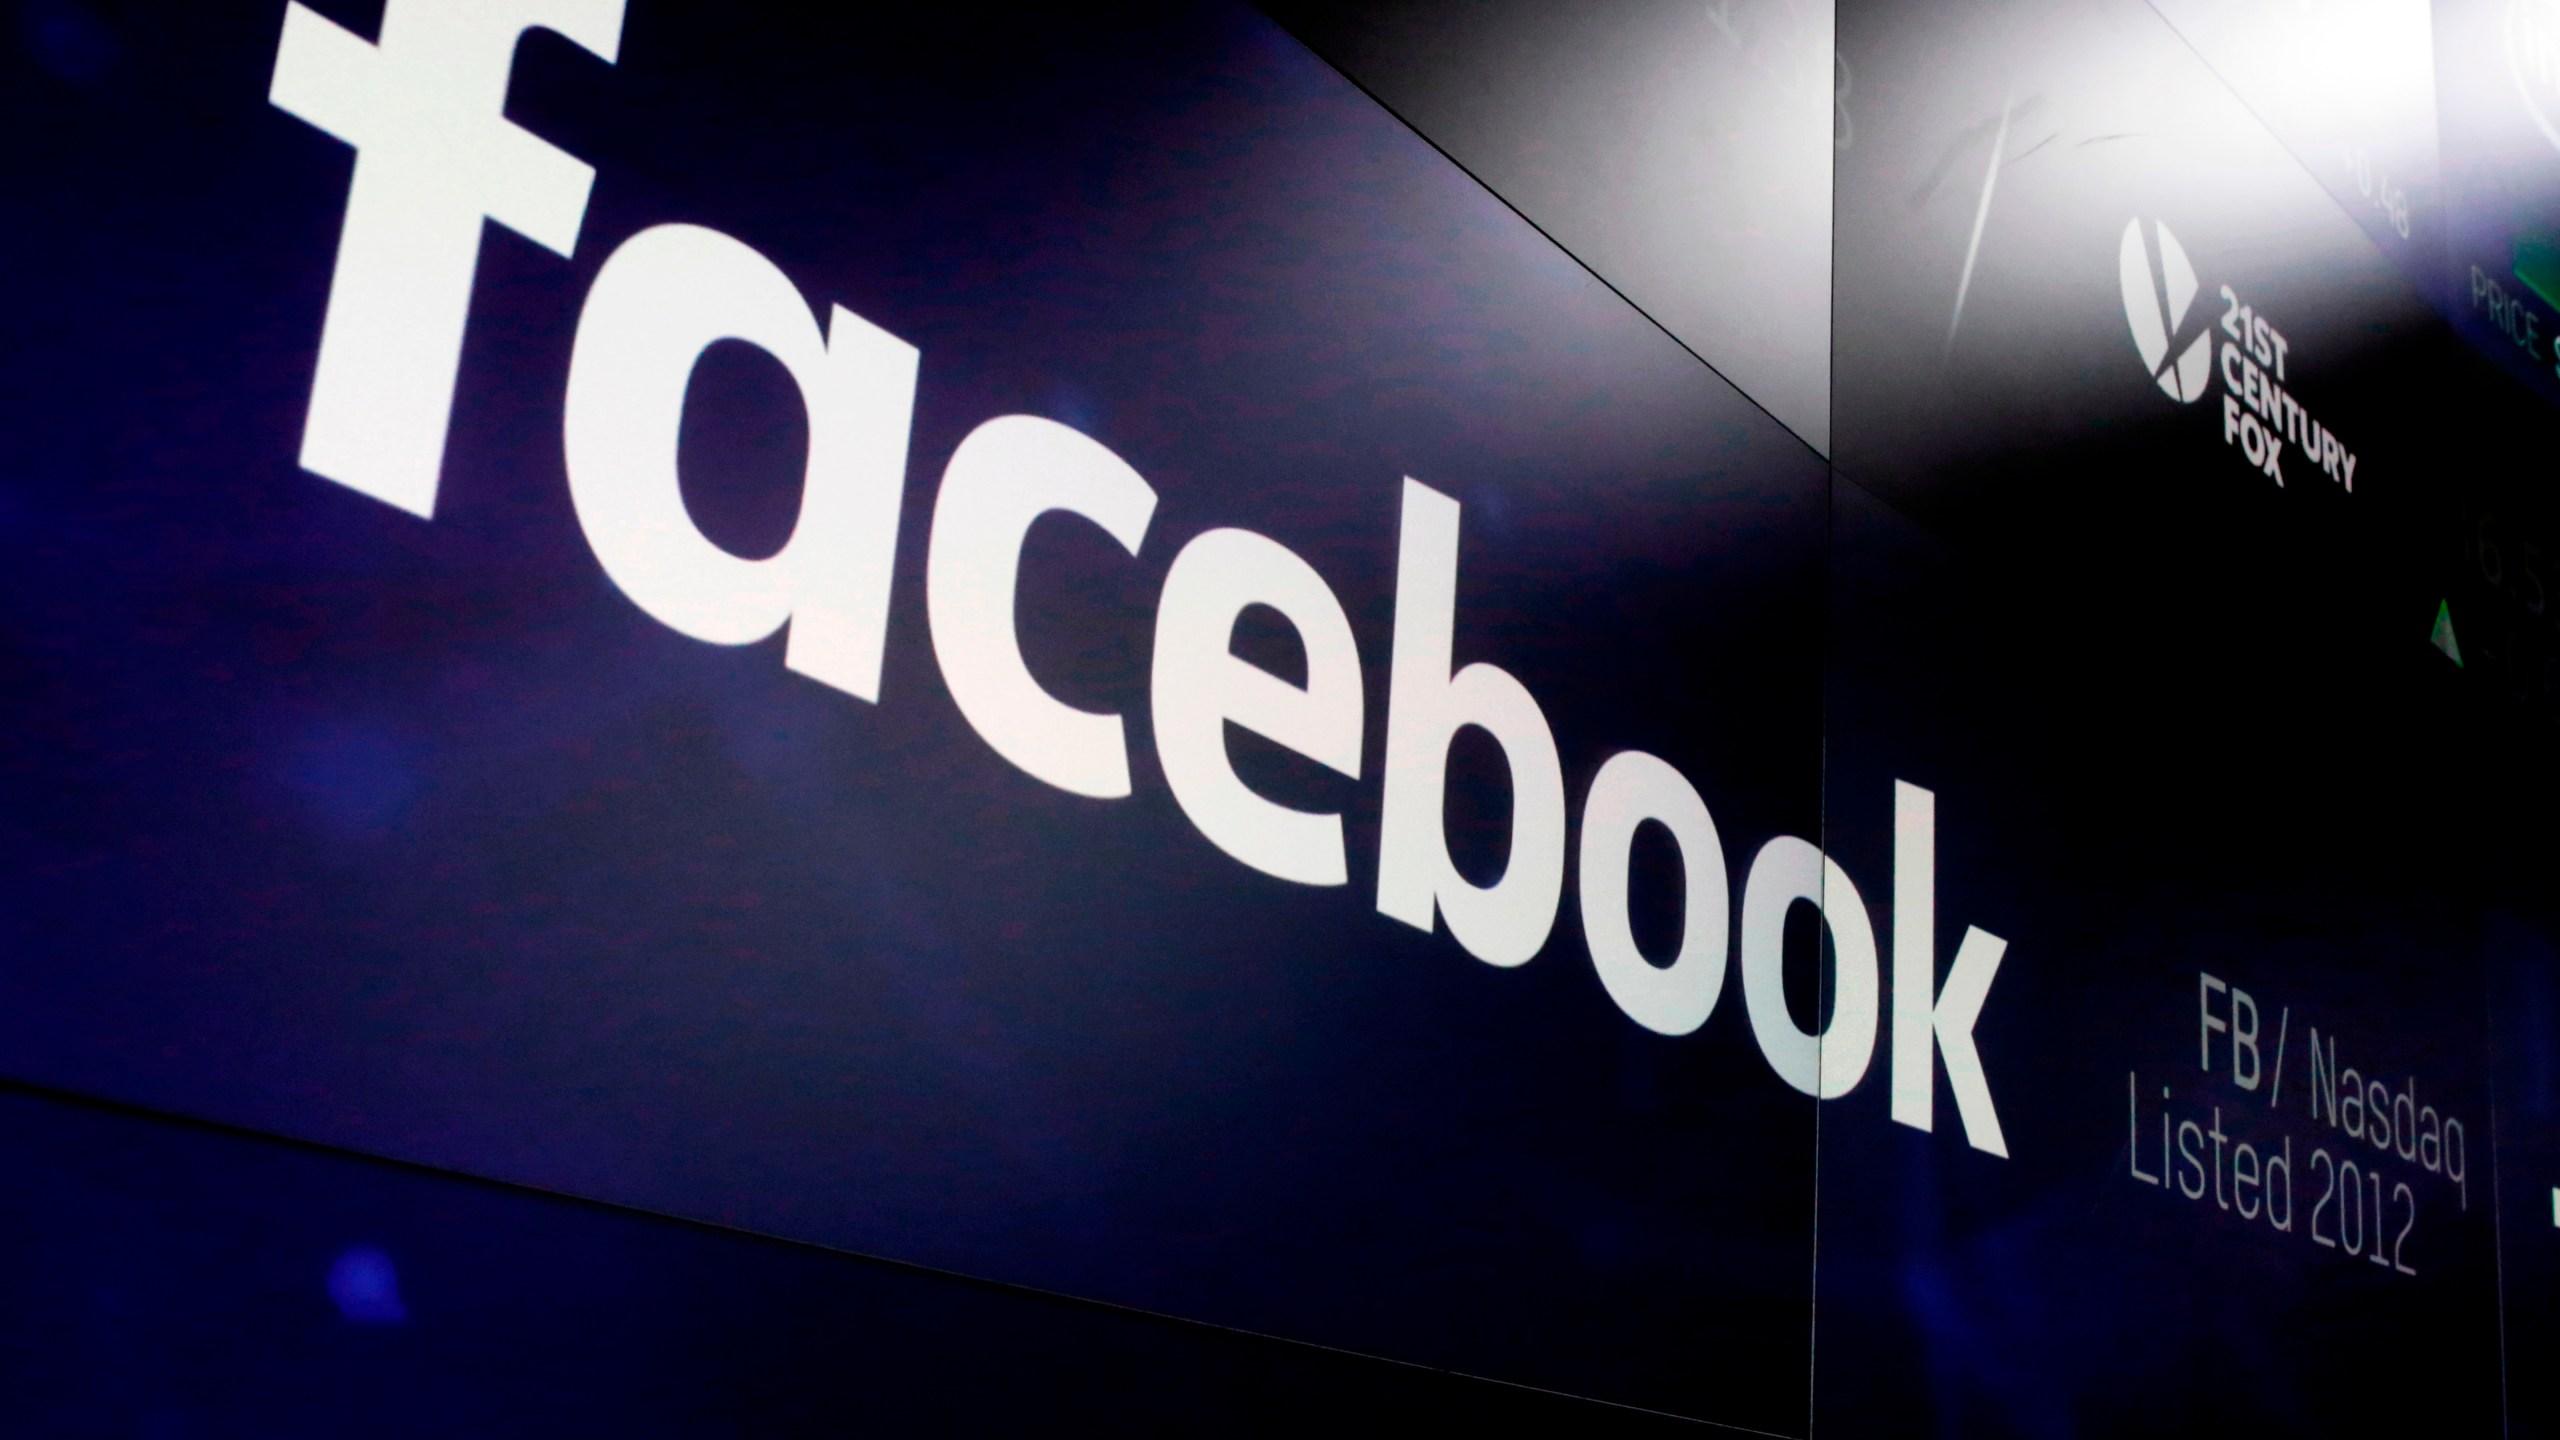 Facebook_Privacy_Scandal_User_Notice_54499-159532.jpg83551343